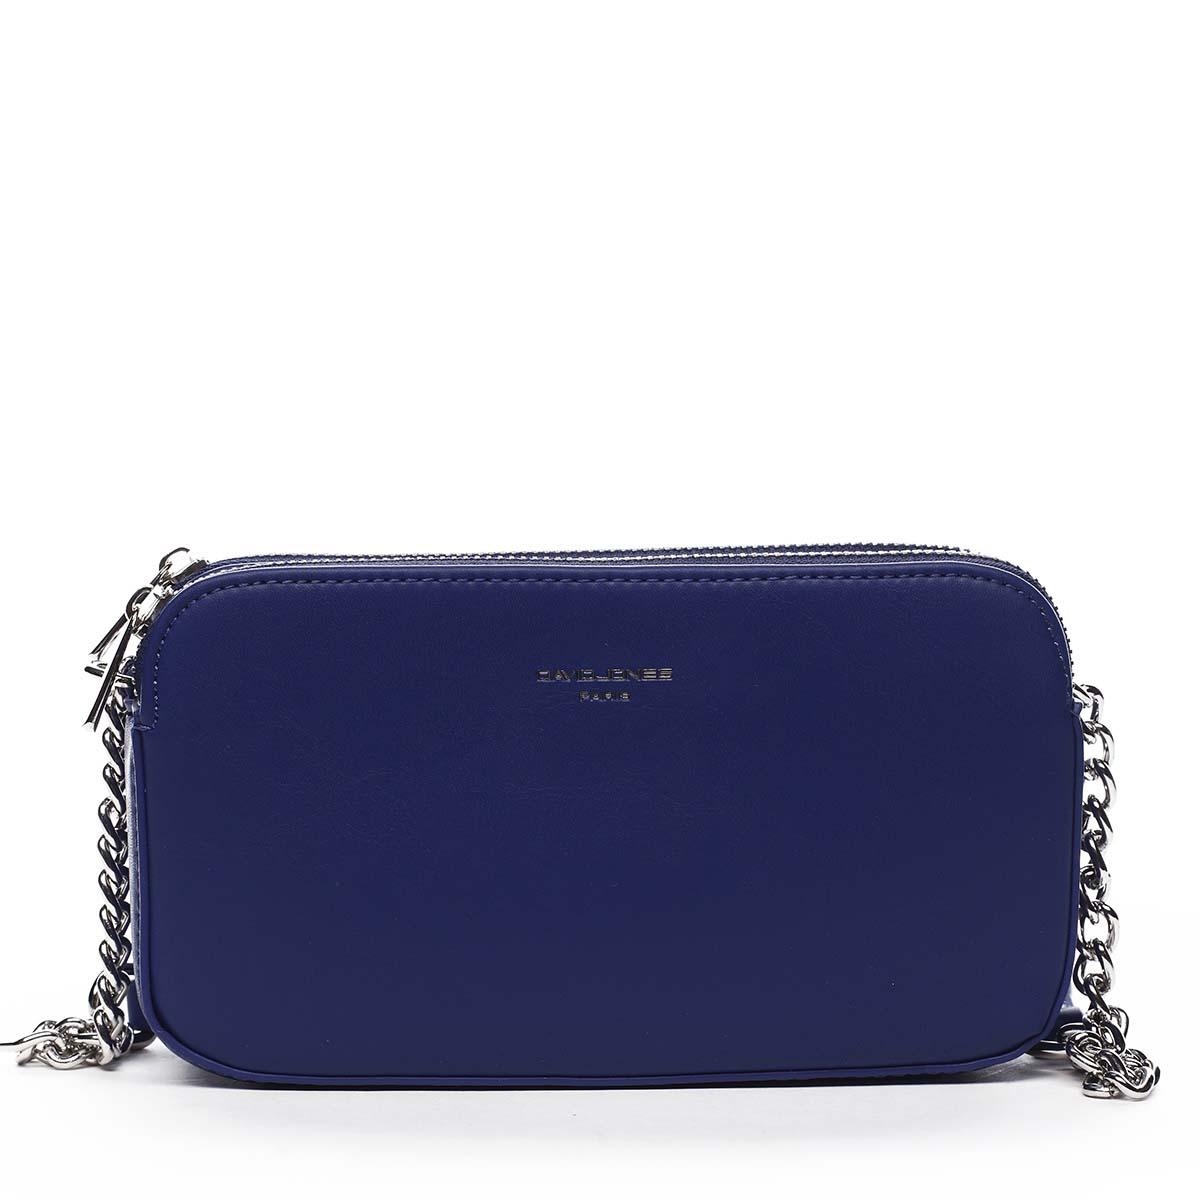 Malá dámska crossbody kabelka modrá - David Jones Lily modrá